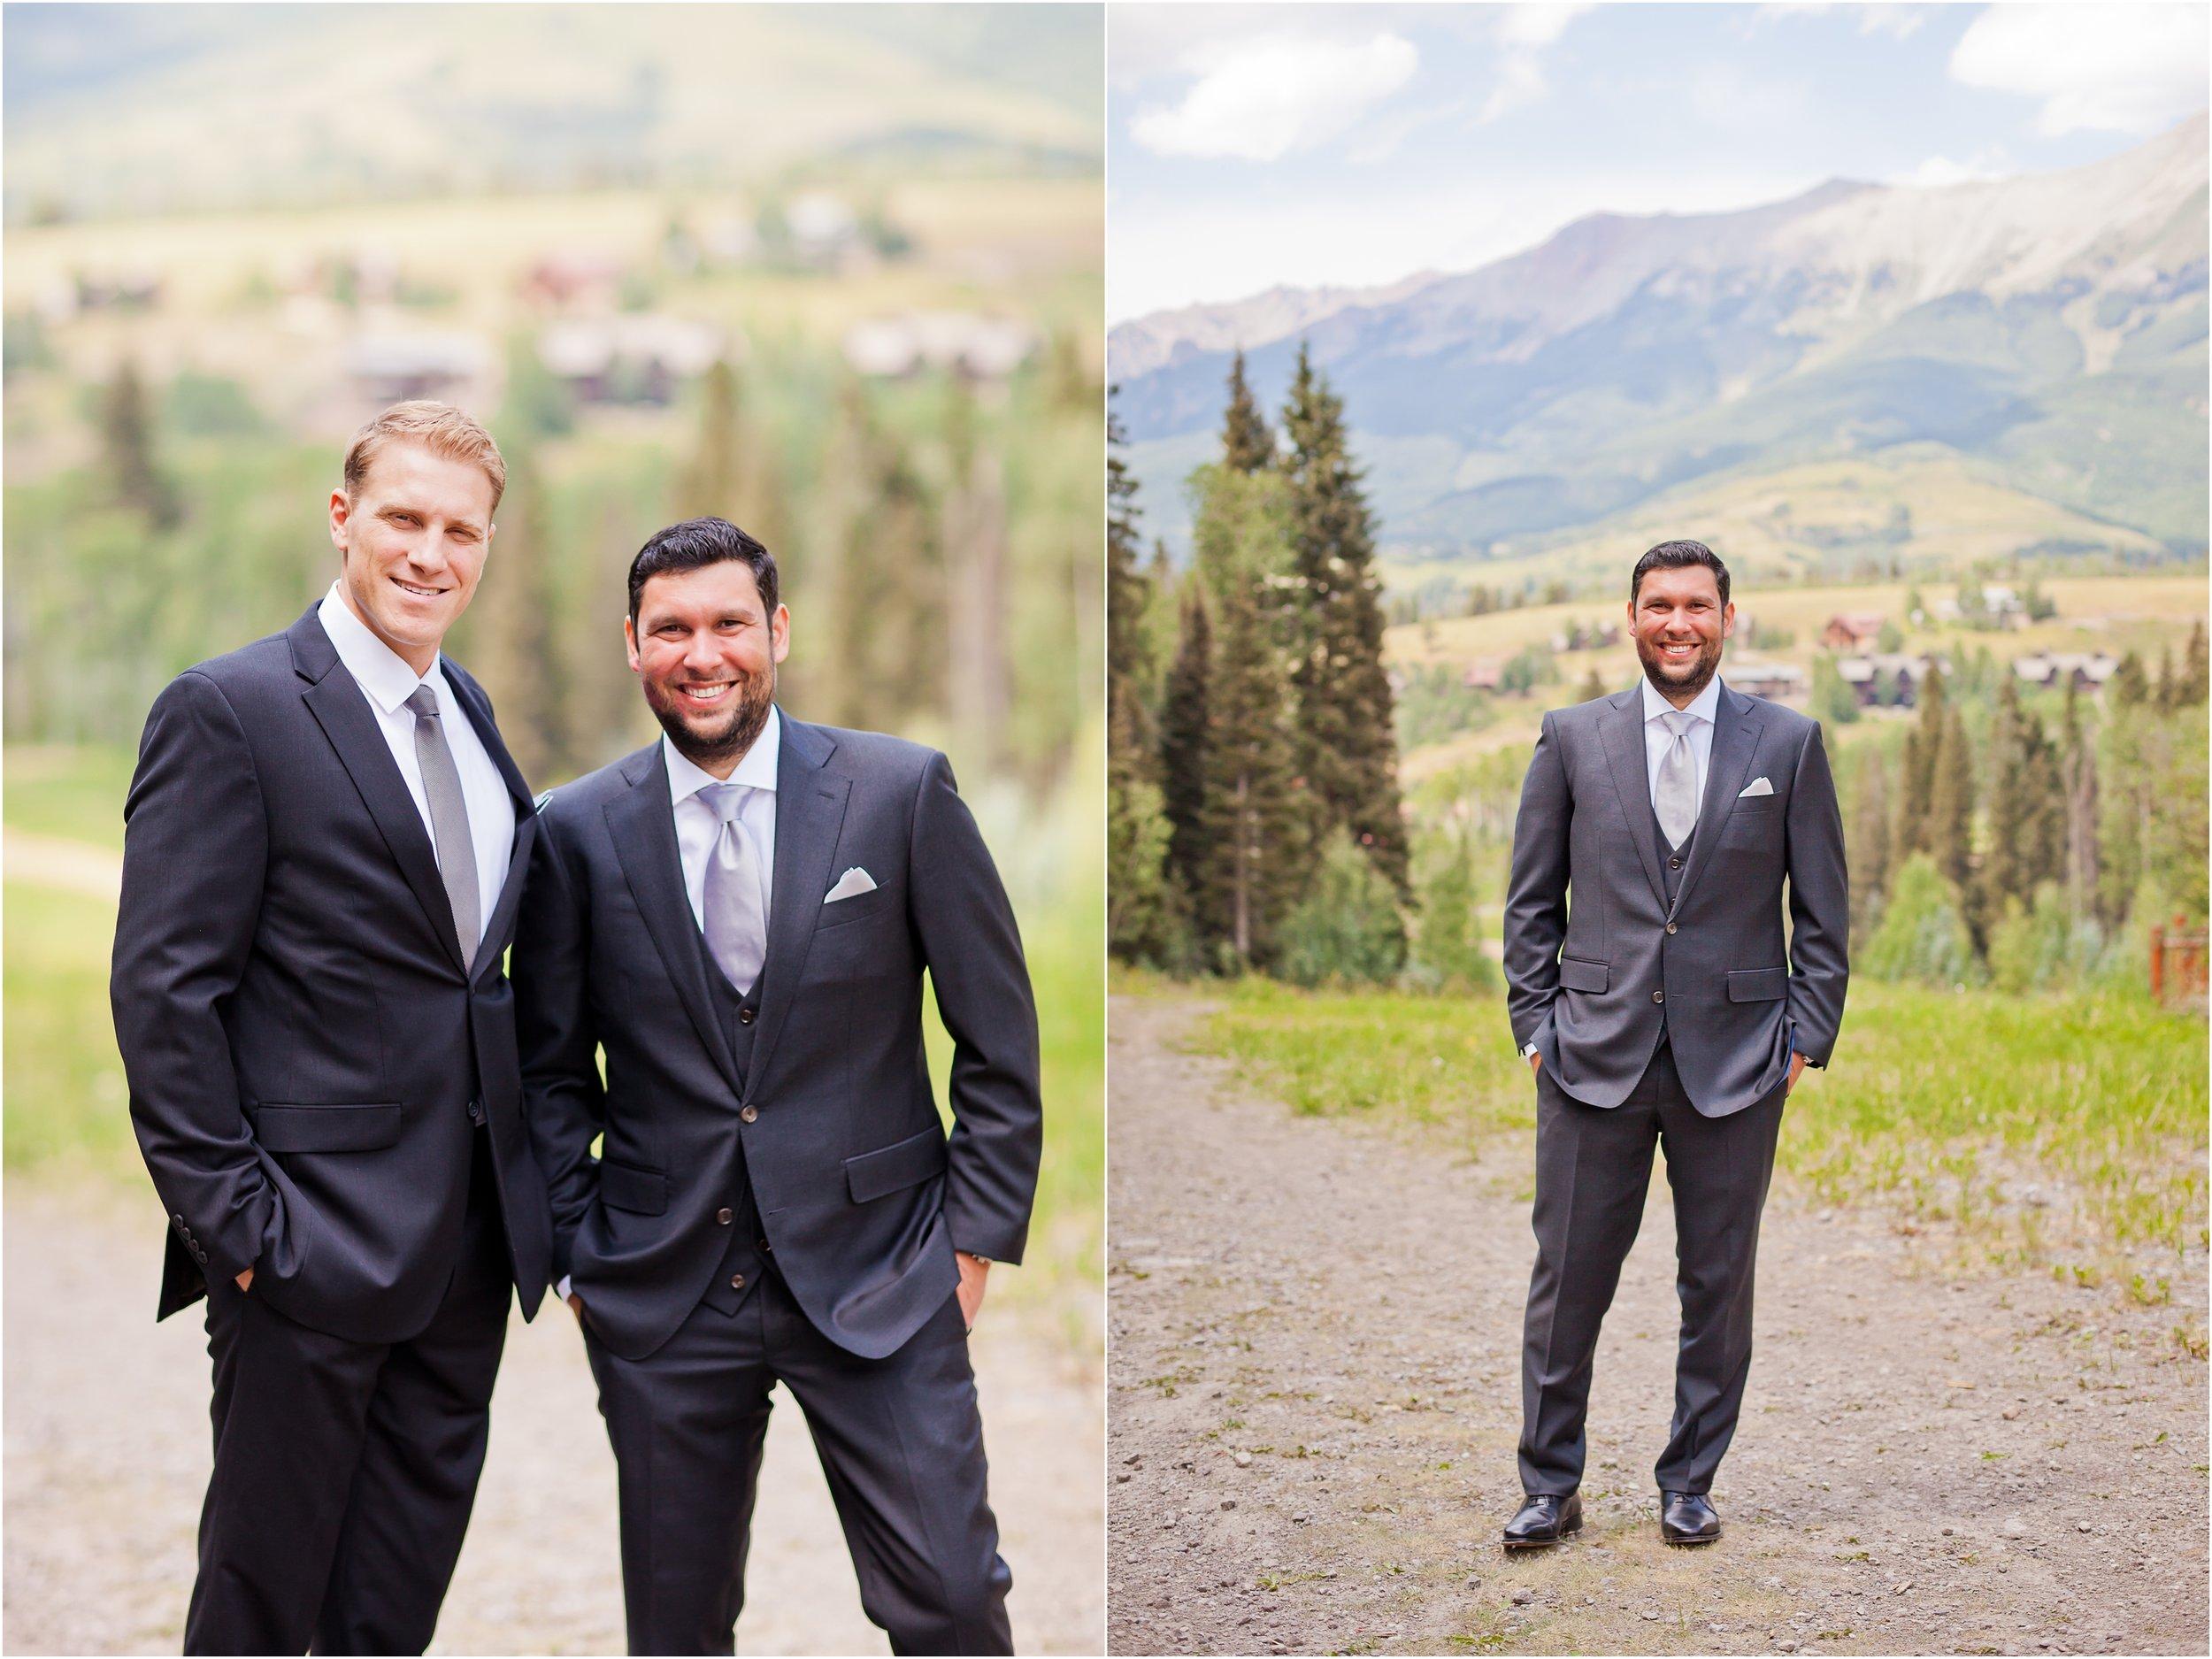 Colorado-Wedding-Photography-Outdoorsy.jpg